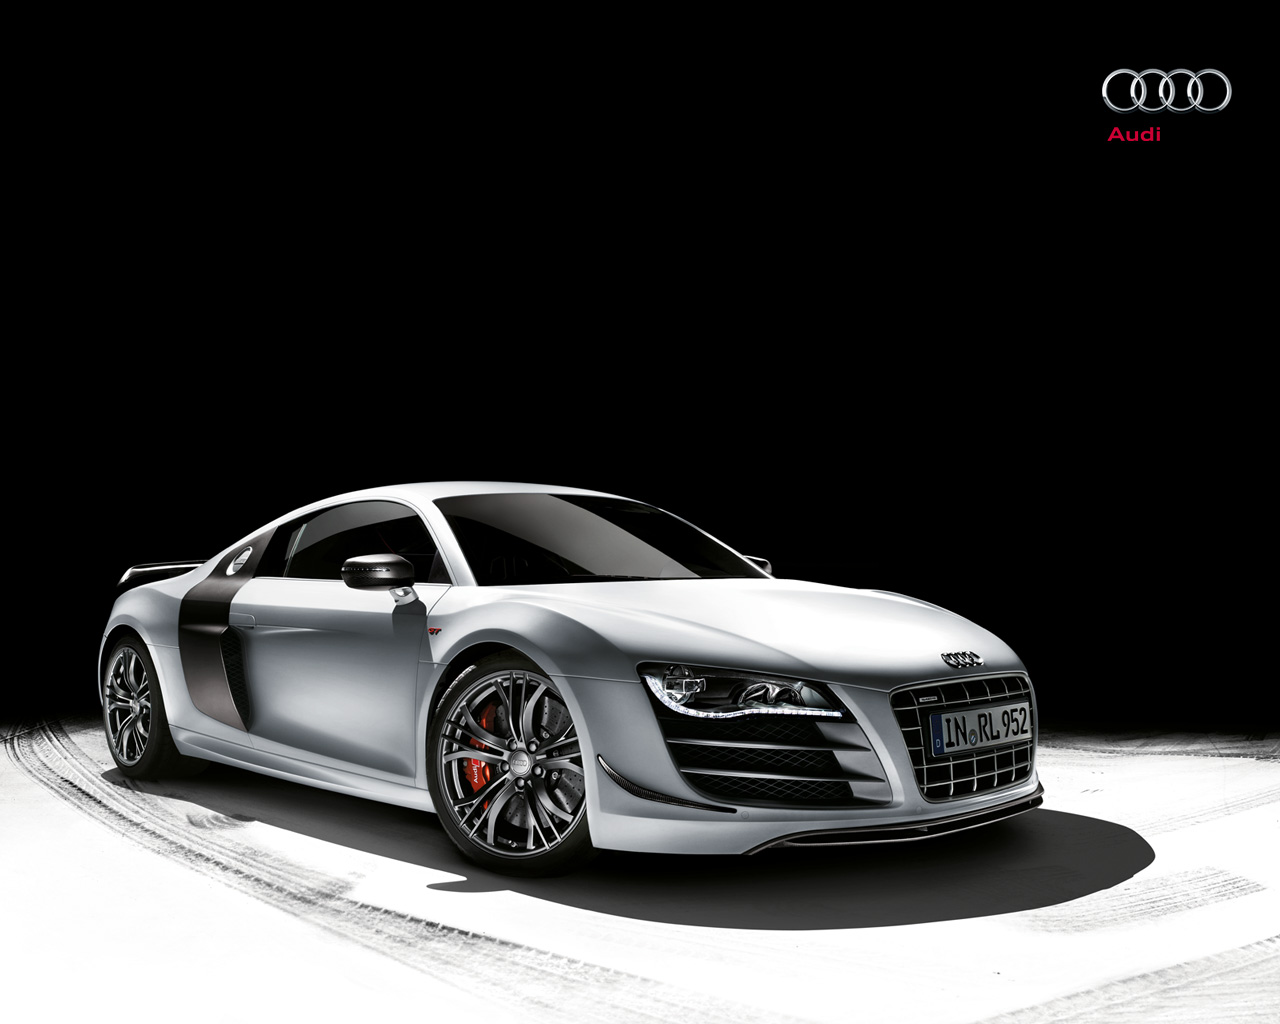 Audi R8 V10 GT Wallpaper FastMotoring 1280x1024